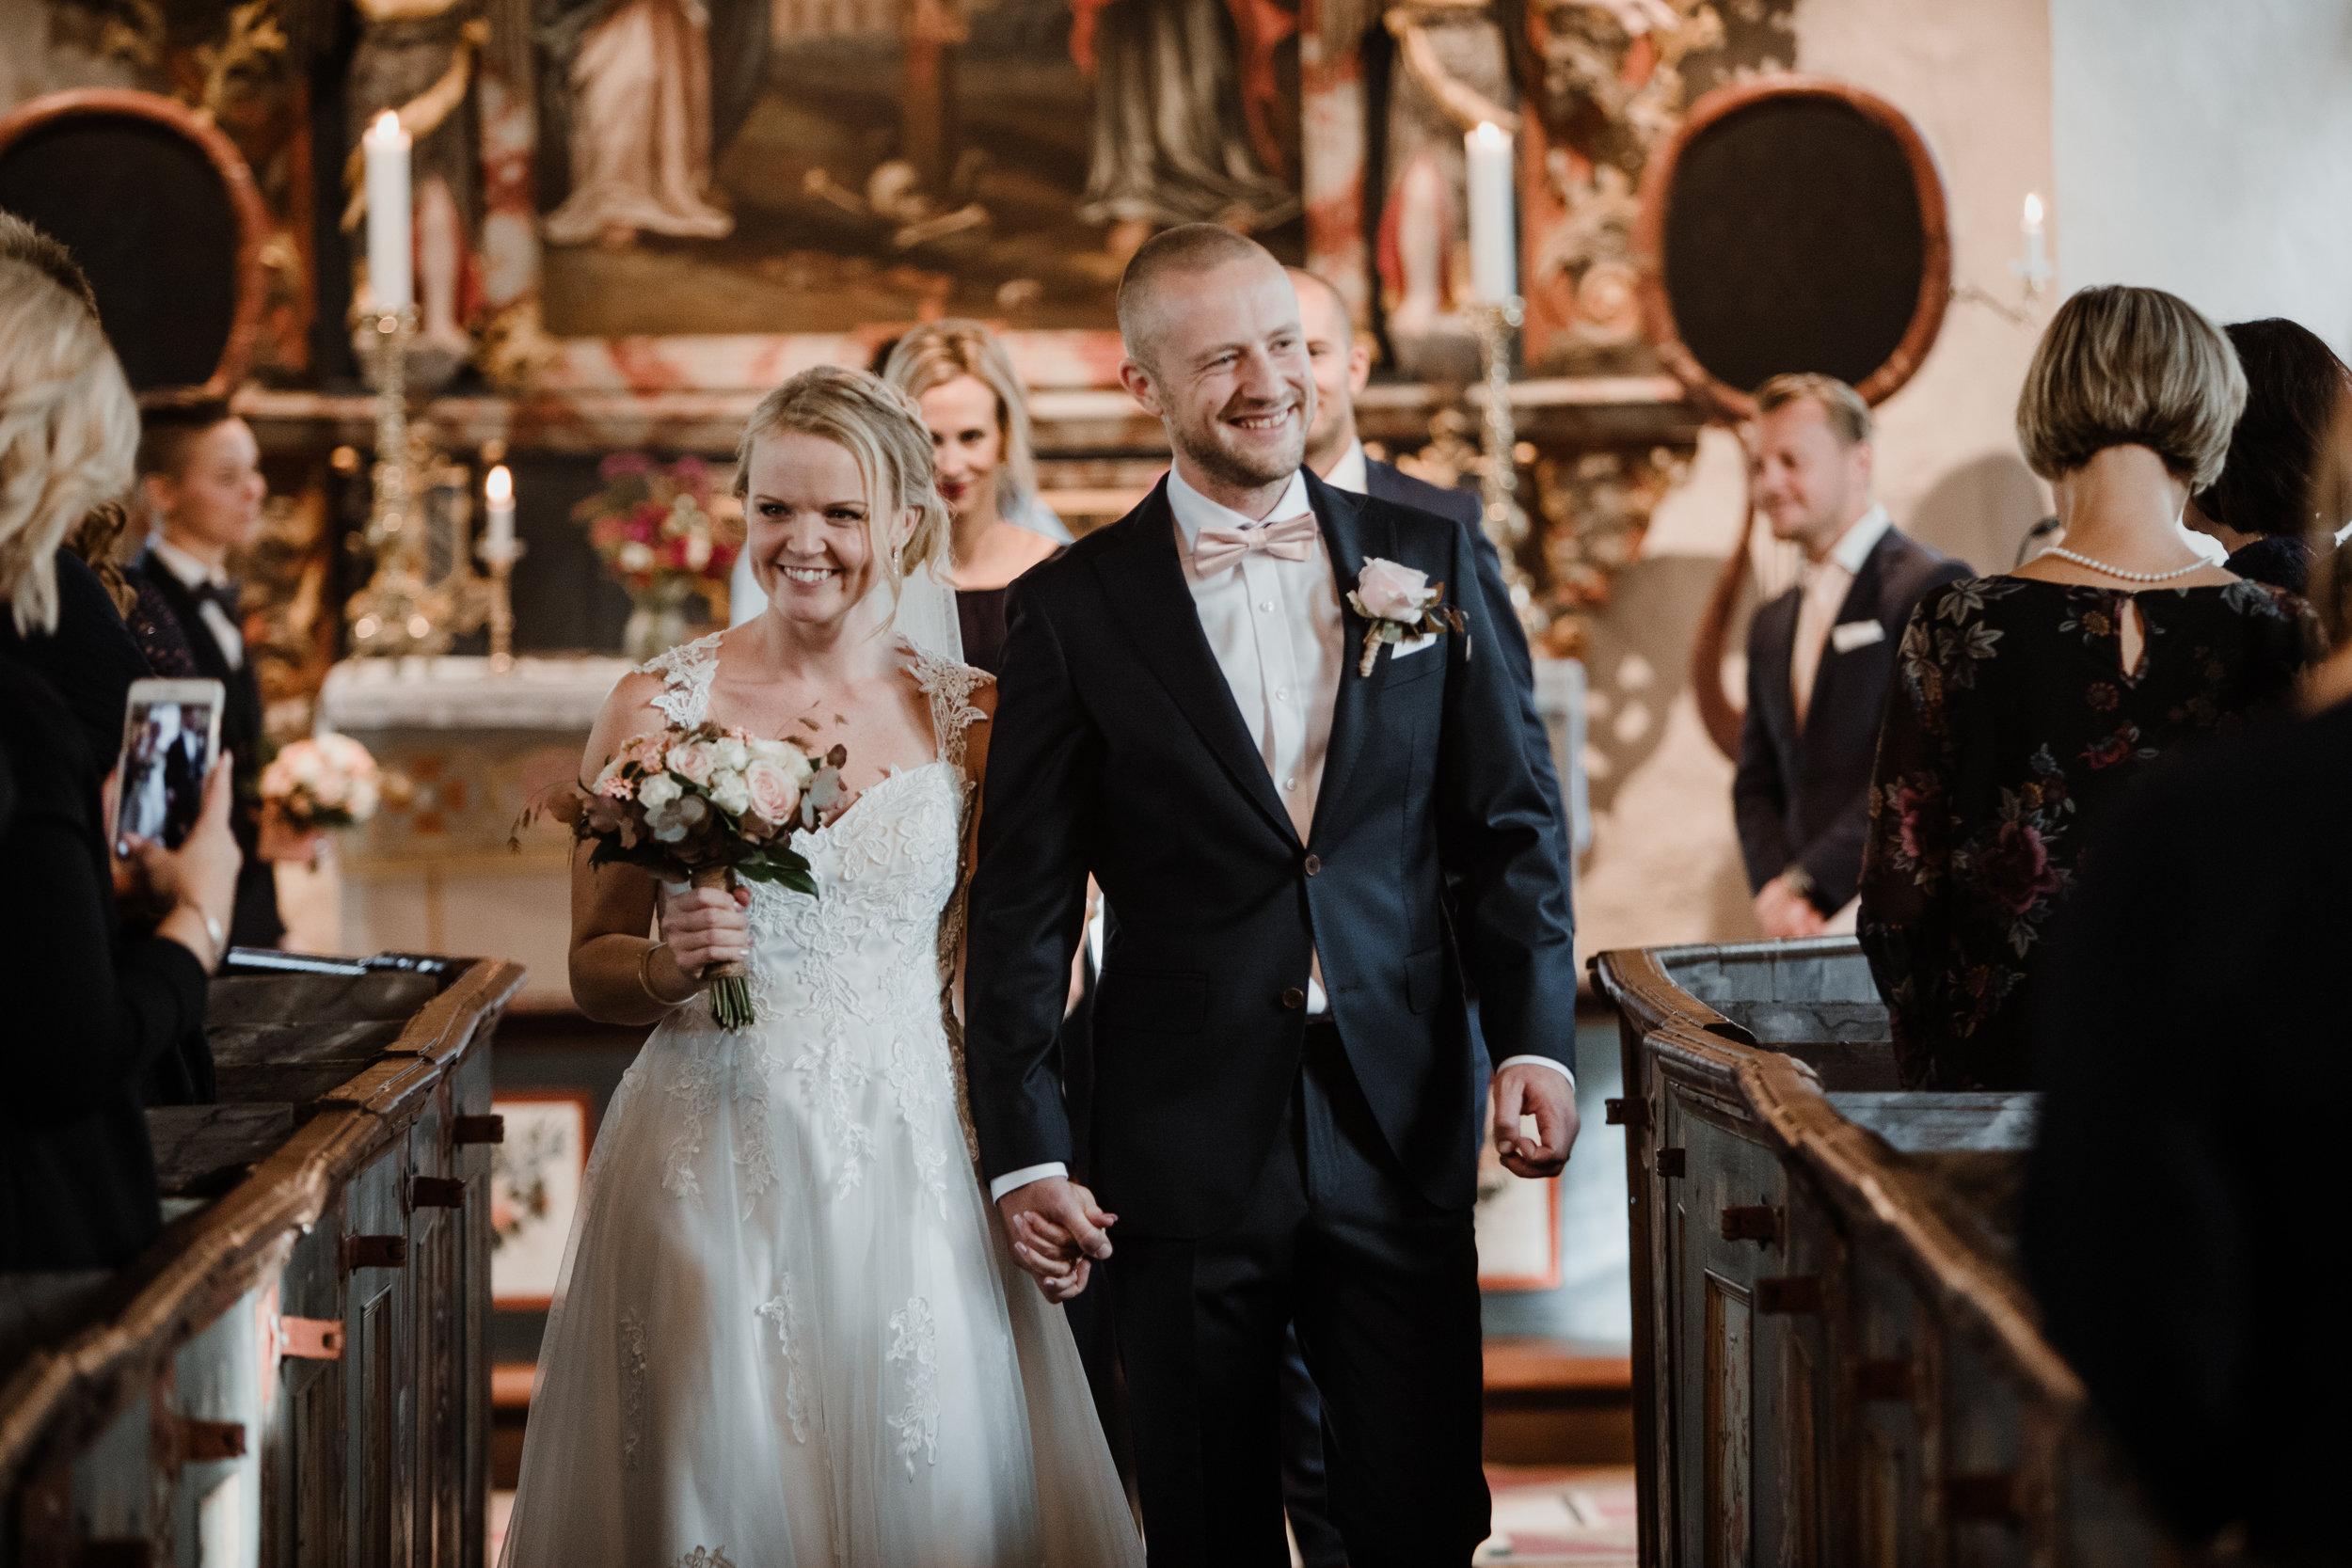 Bröllopsfotograf-Uddetorp Säteri-Höstbröllop-Fotograf Emilia- Bröllopsfotograf Borås-40.jpg